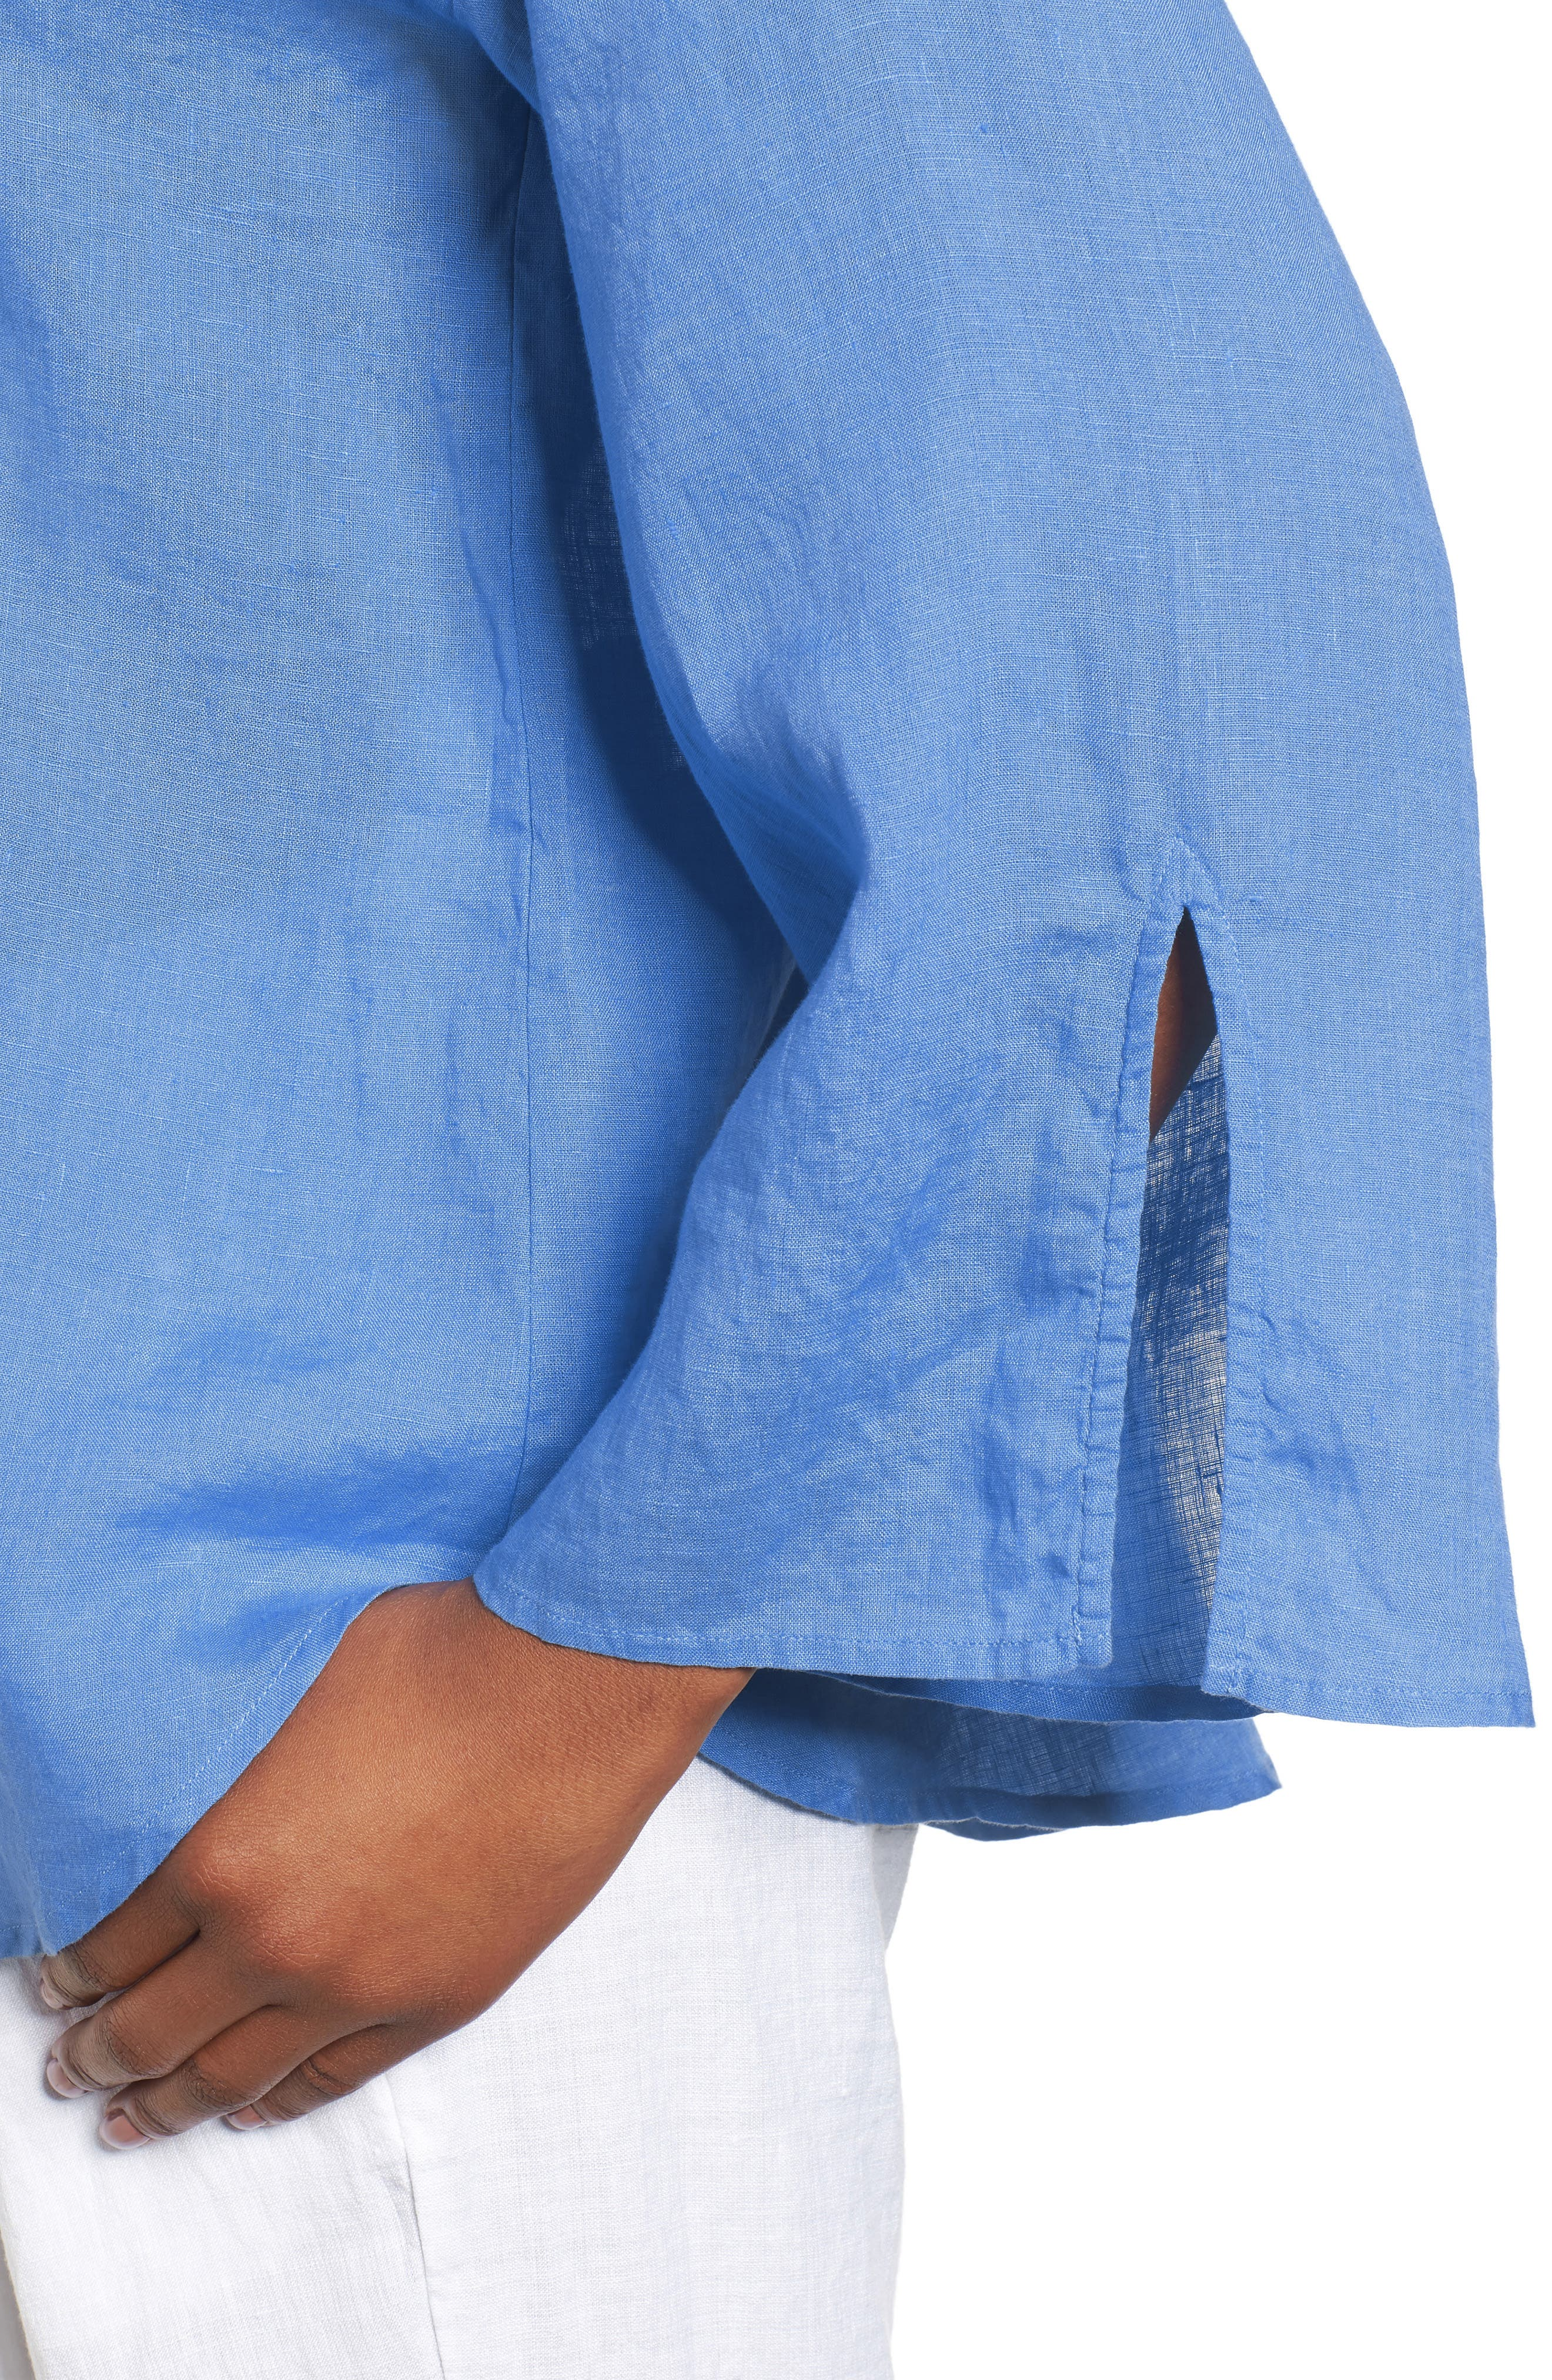 Woven Organic Linen Top,                             Alternate thumbnail 4, color,                             Bluebell